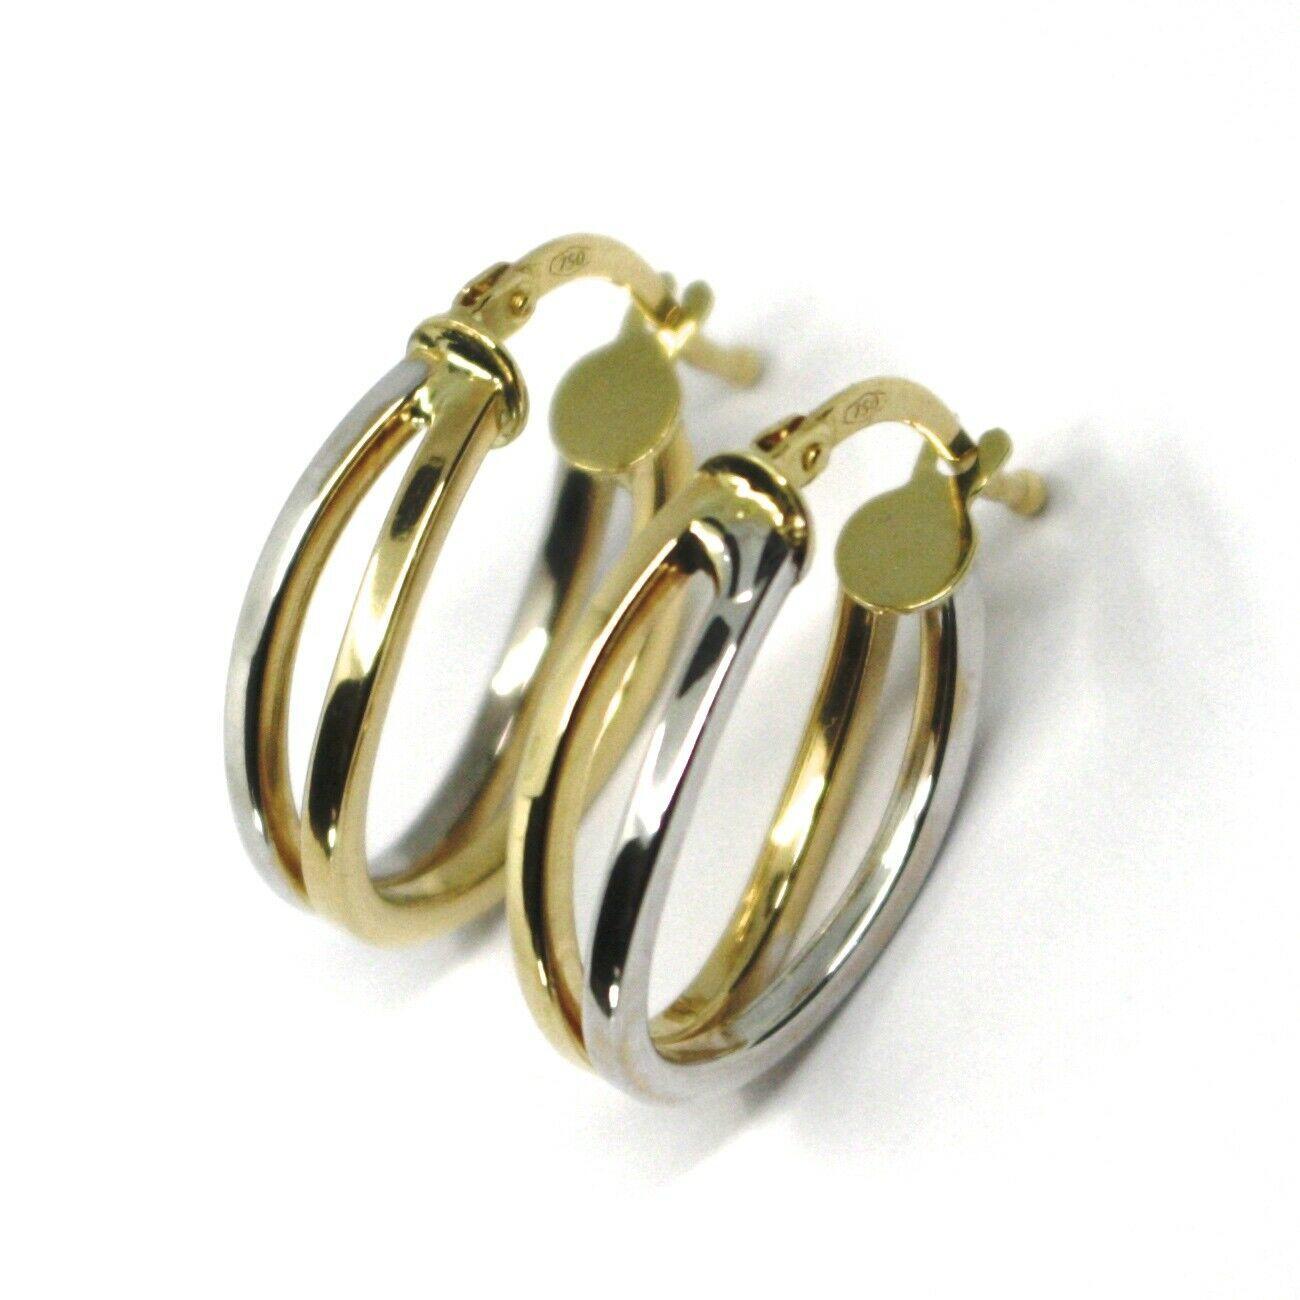 18K YELLOW WHITE GOLD PENDANT EARRINGS ONDULATE OVAL DOUBLE TUBE HOOPS 2cm